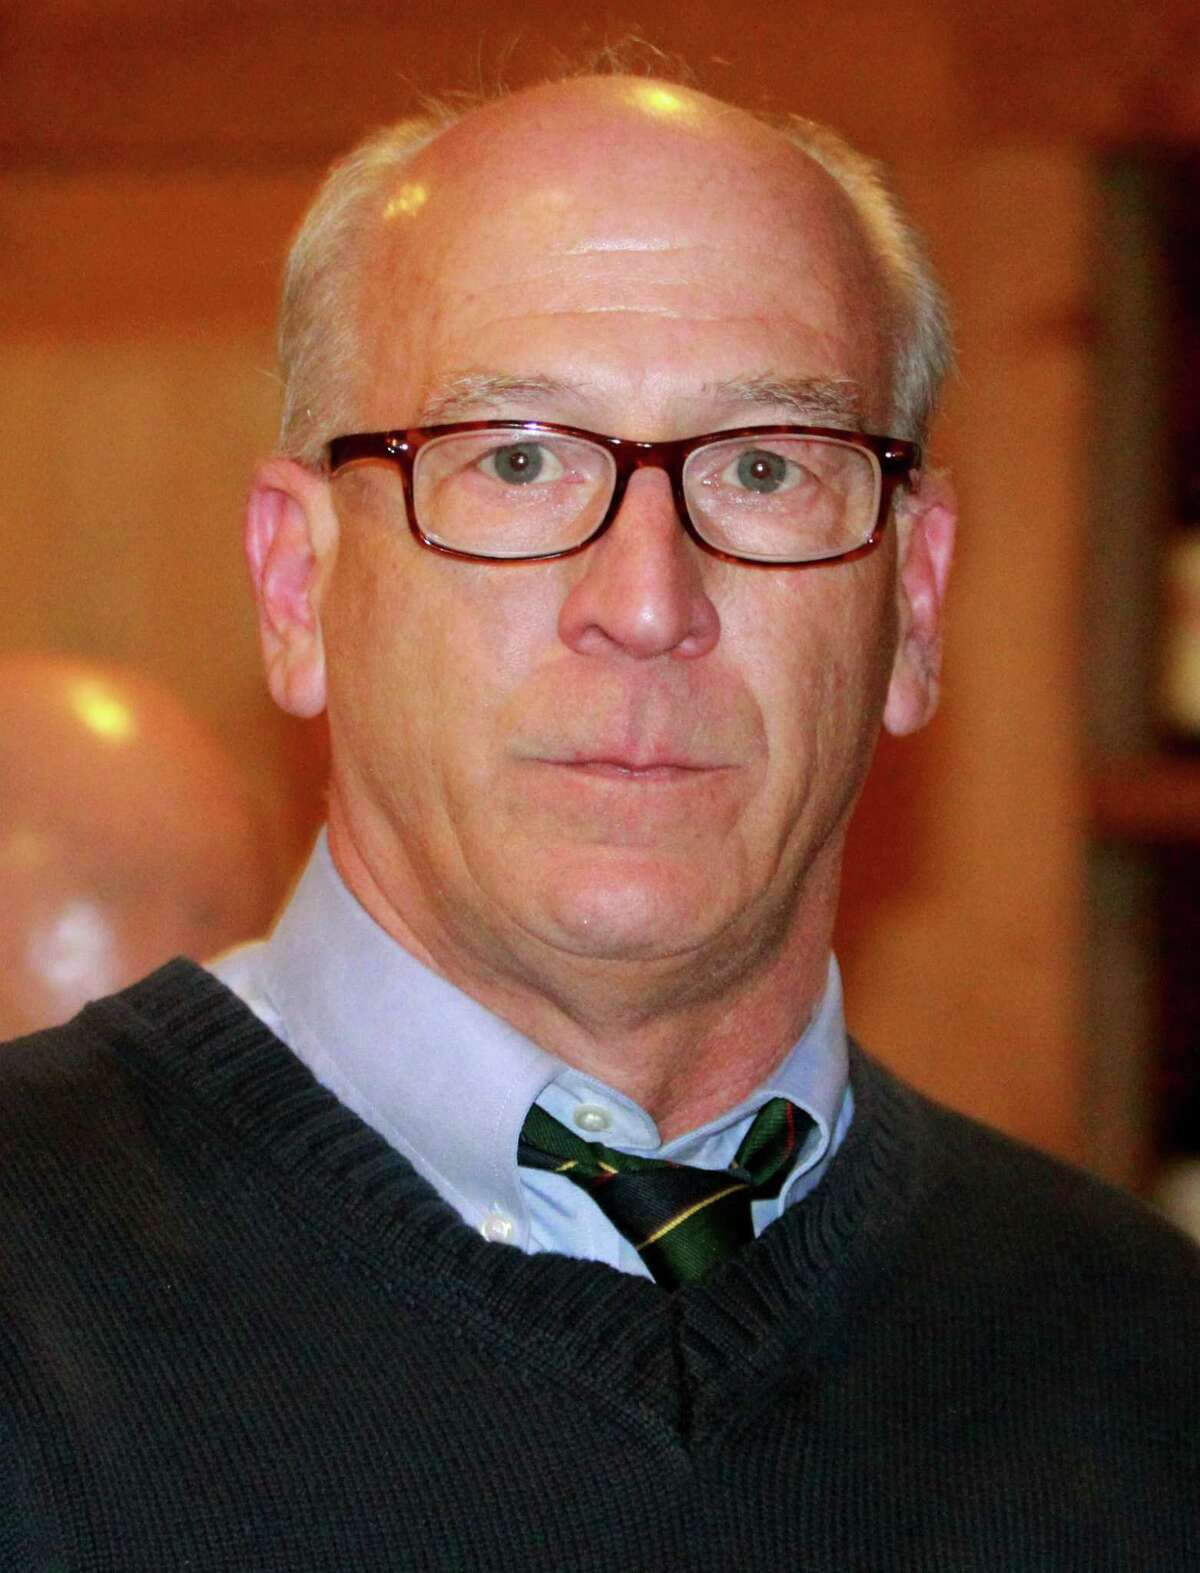 Democratic state representative candidate Phil Young.